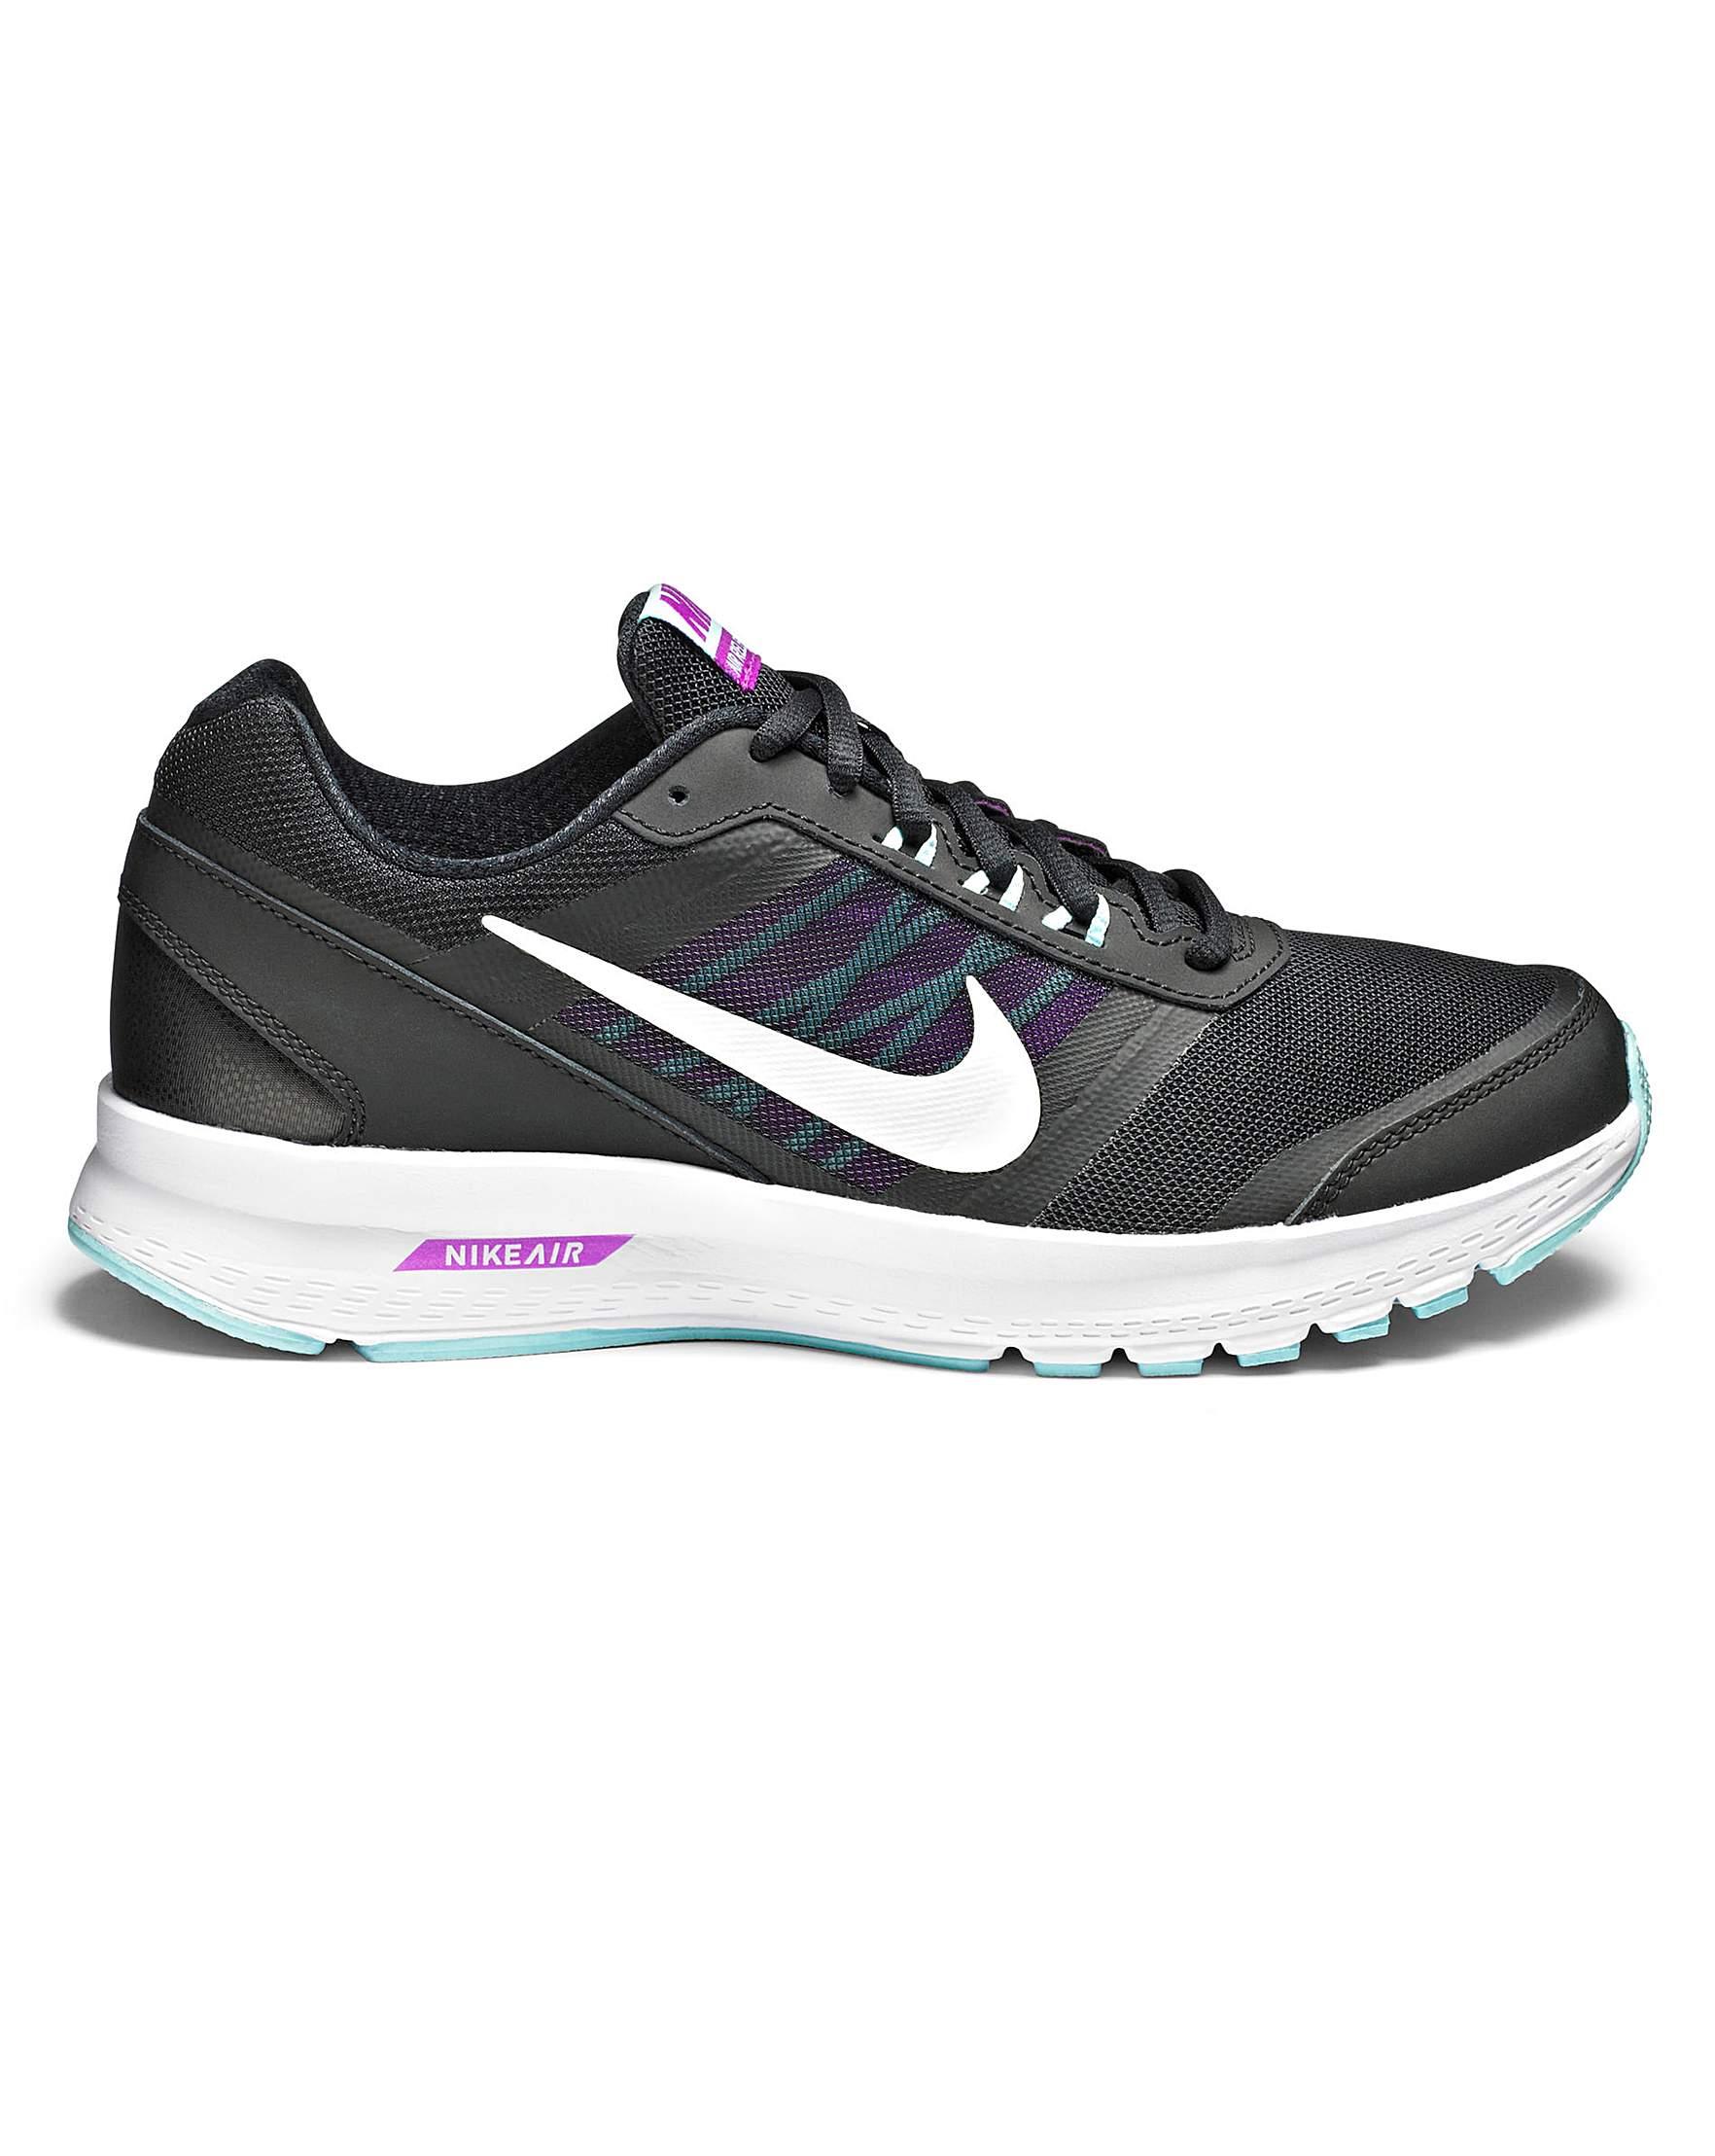 db28ba1b7dc Nike Air Relentless 5 Trainers